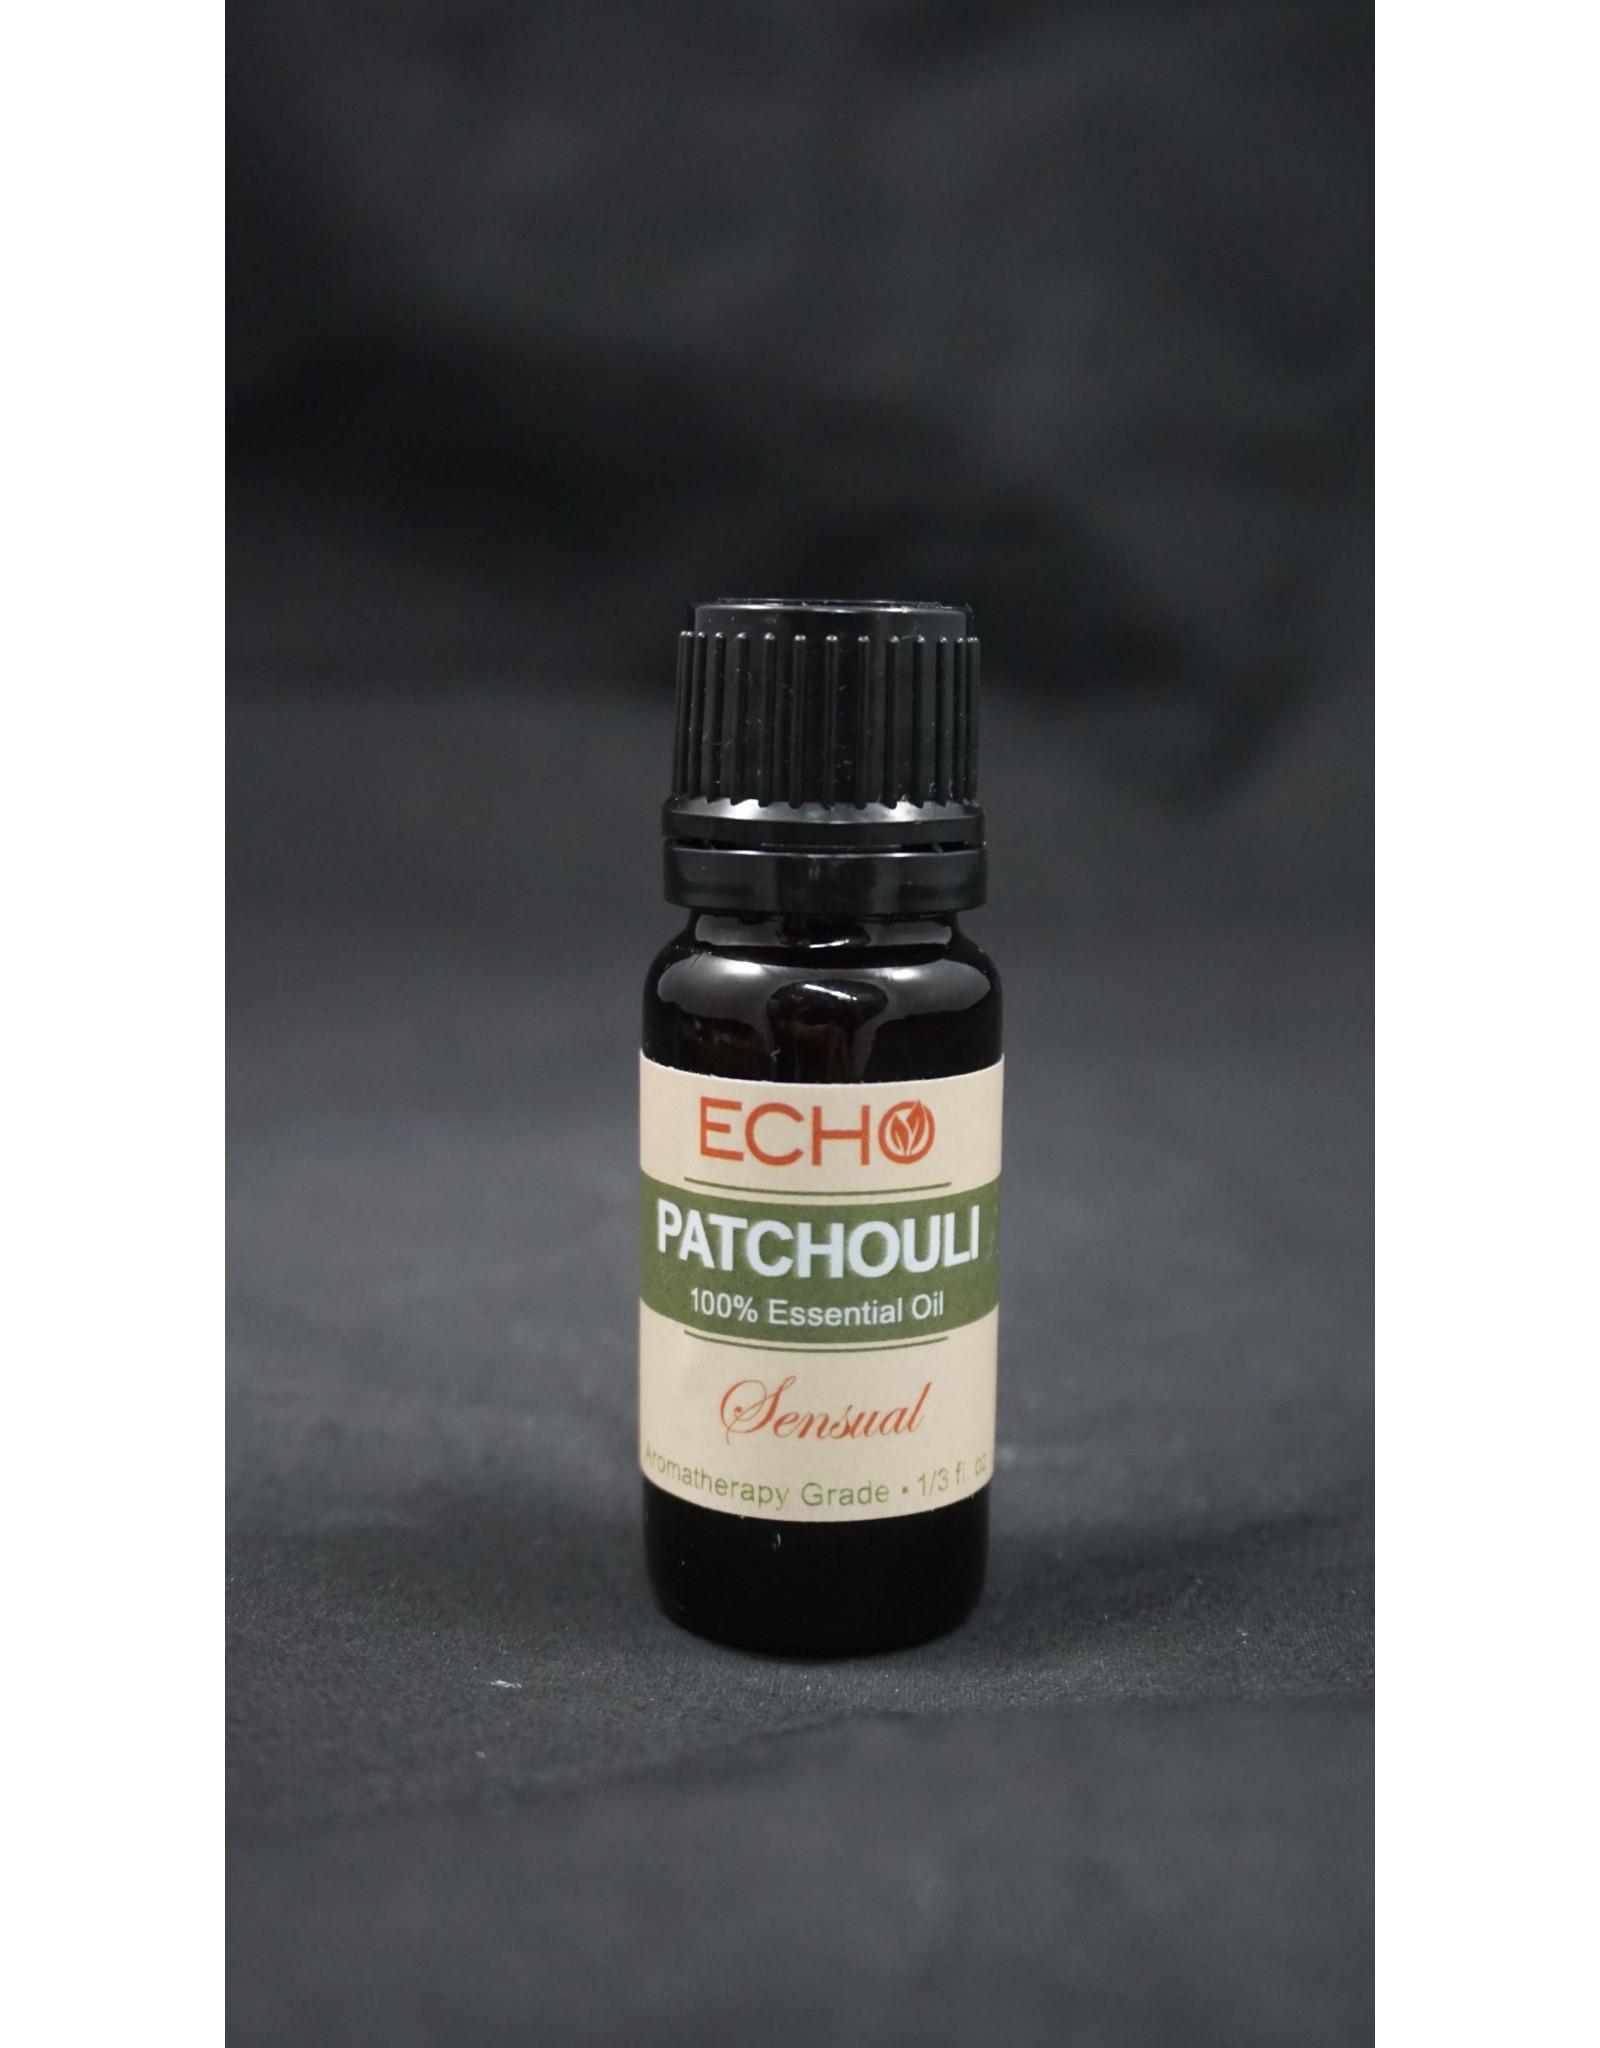 Echo Essential Oils - Patchouli